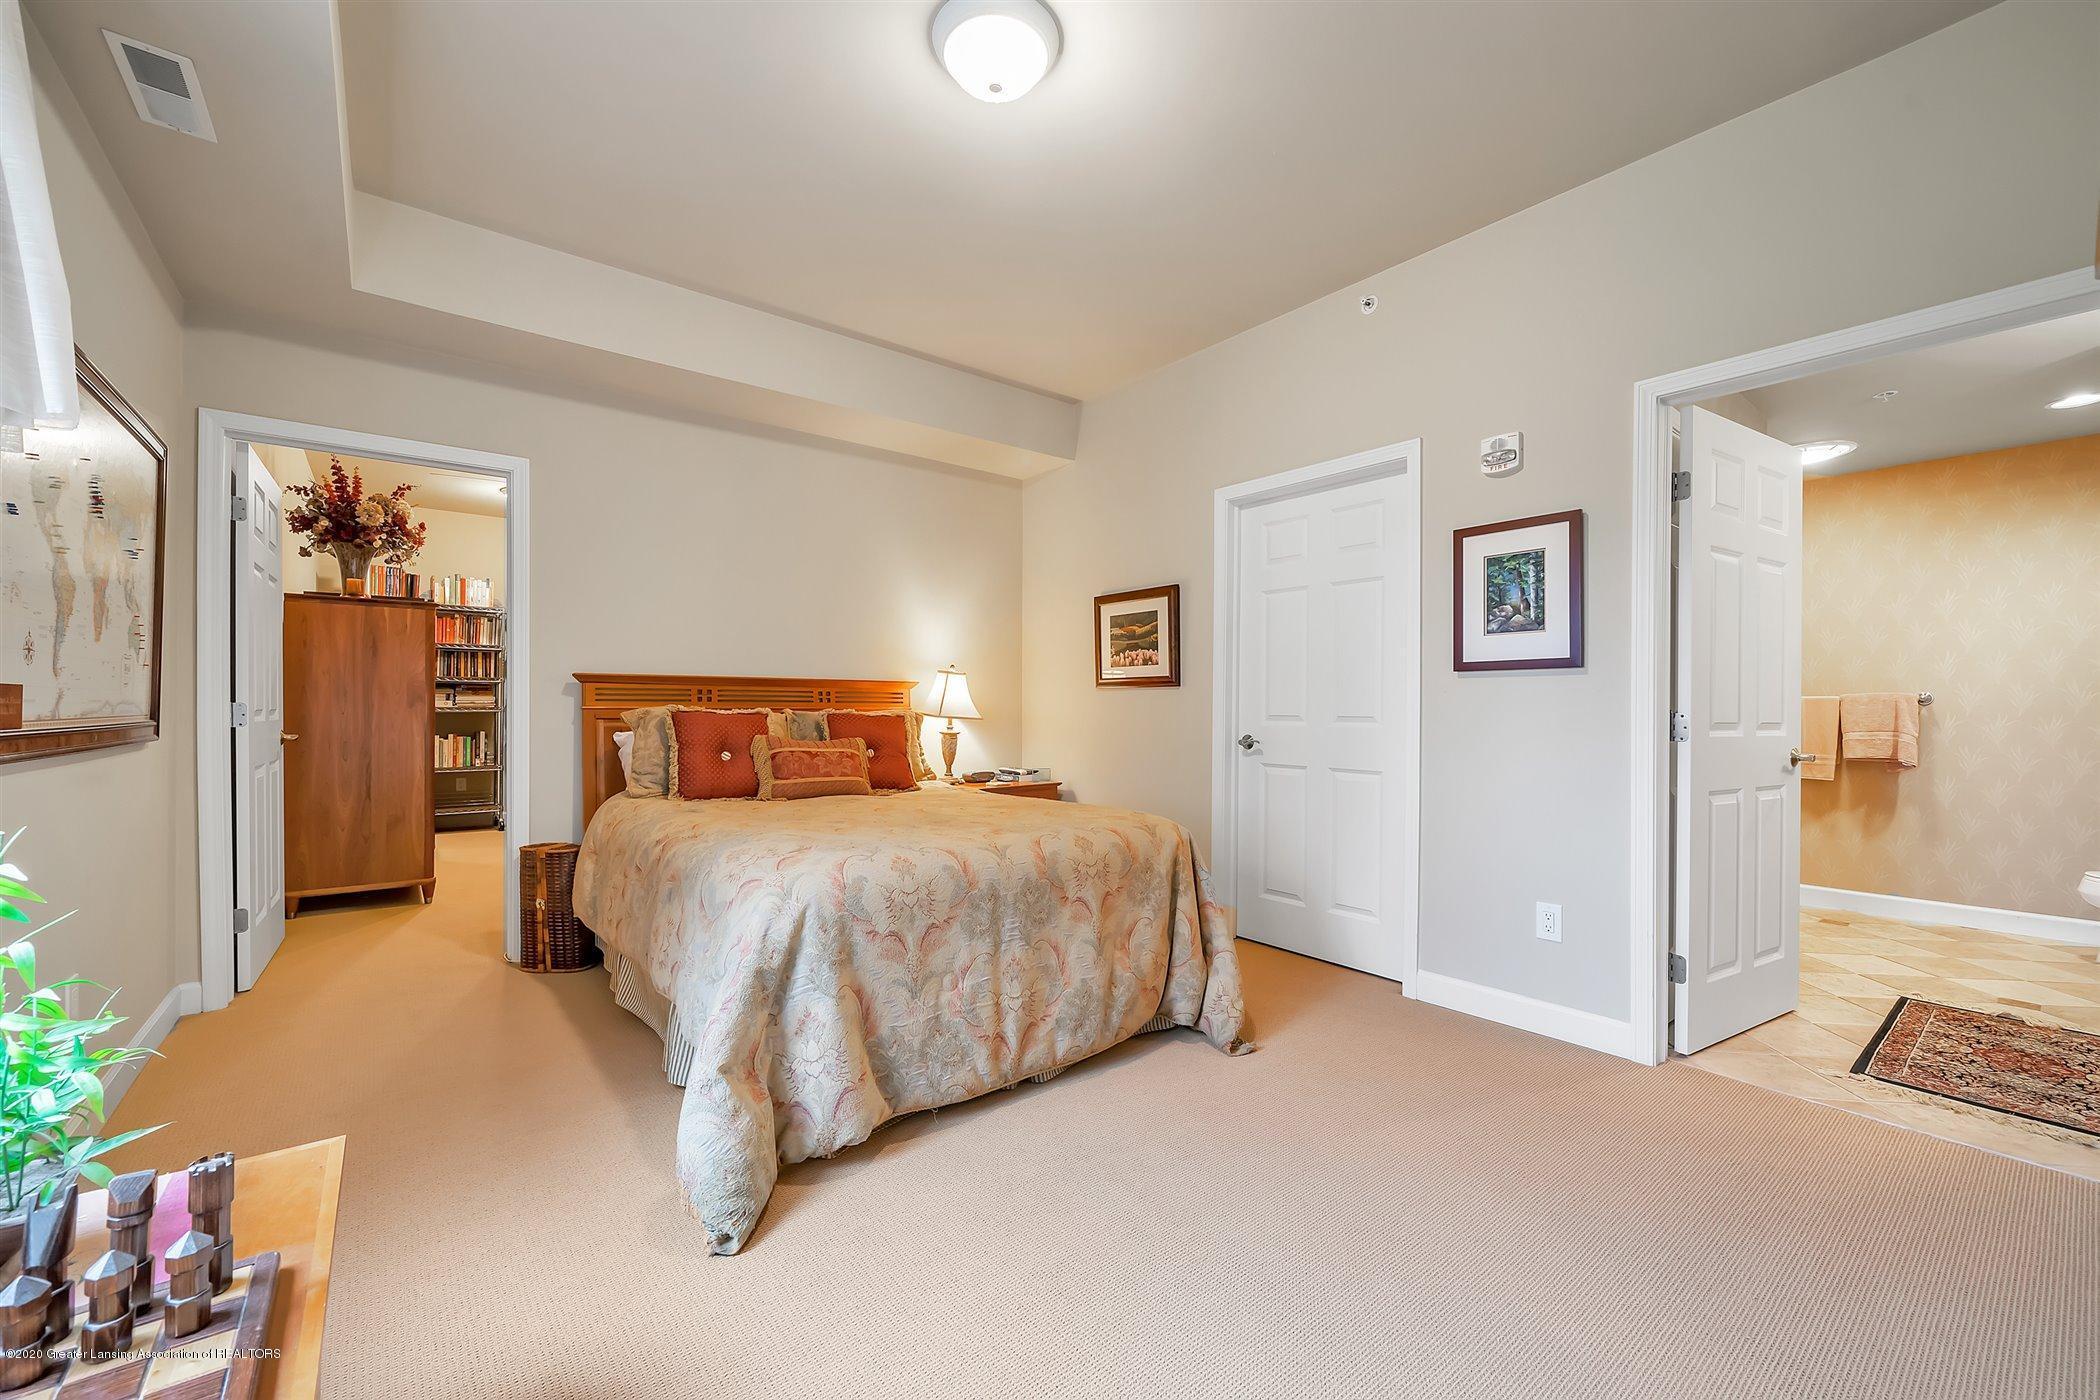 220 M. A. C. Ave Apt 409 - Master Bedroom - 12